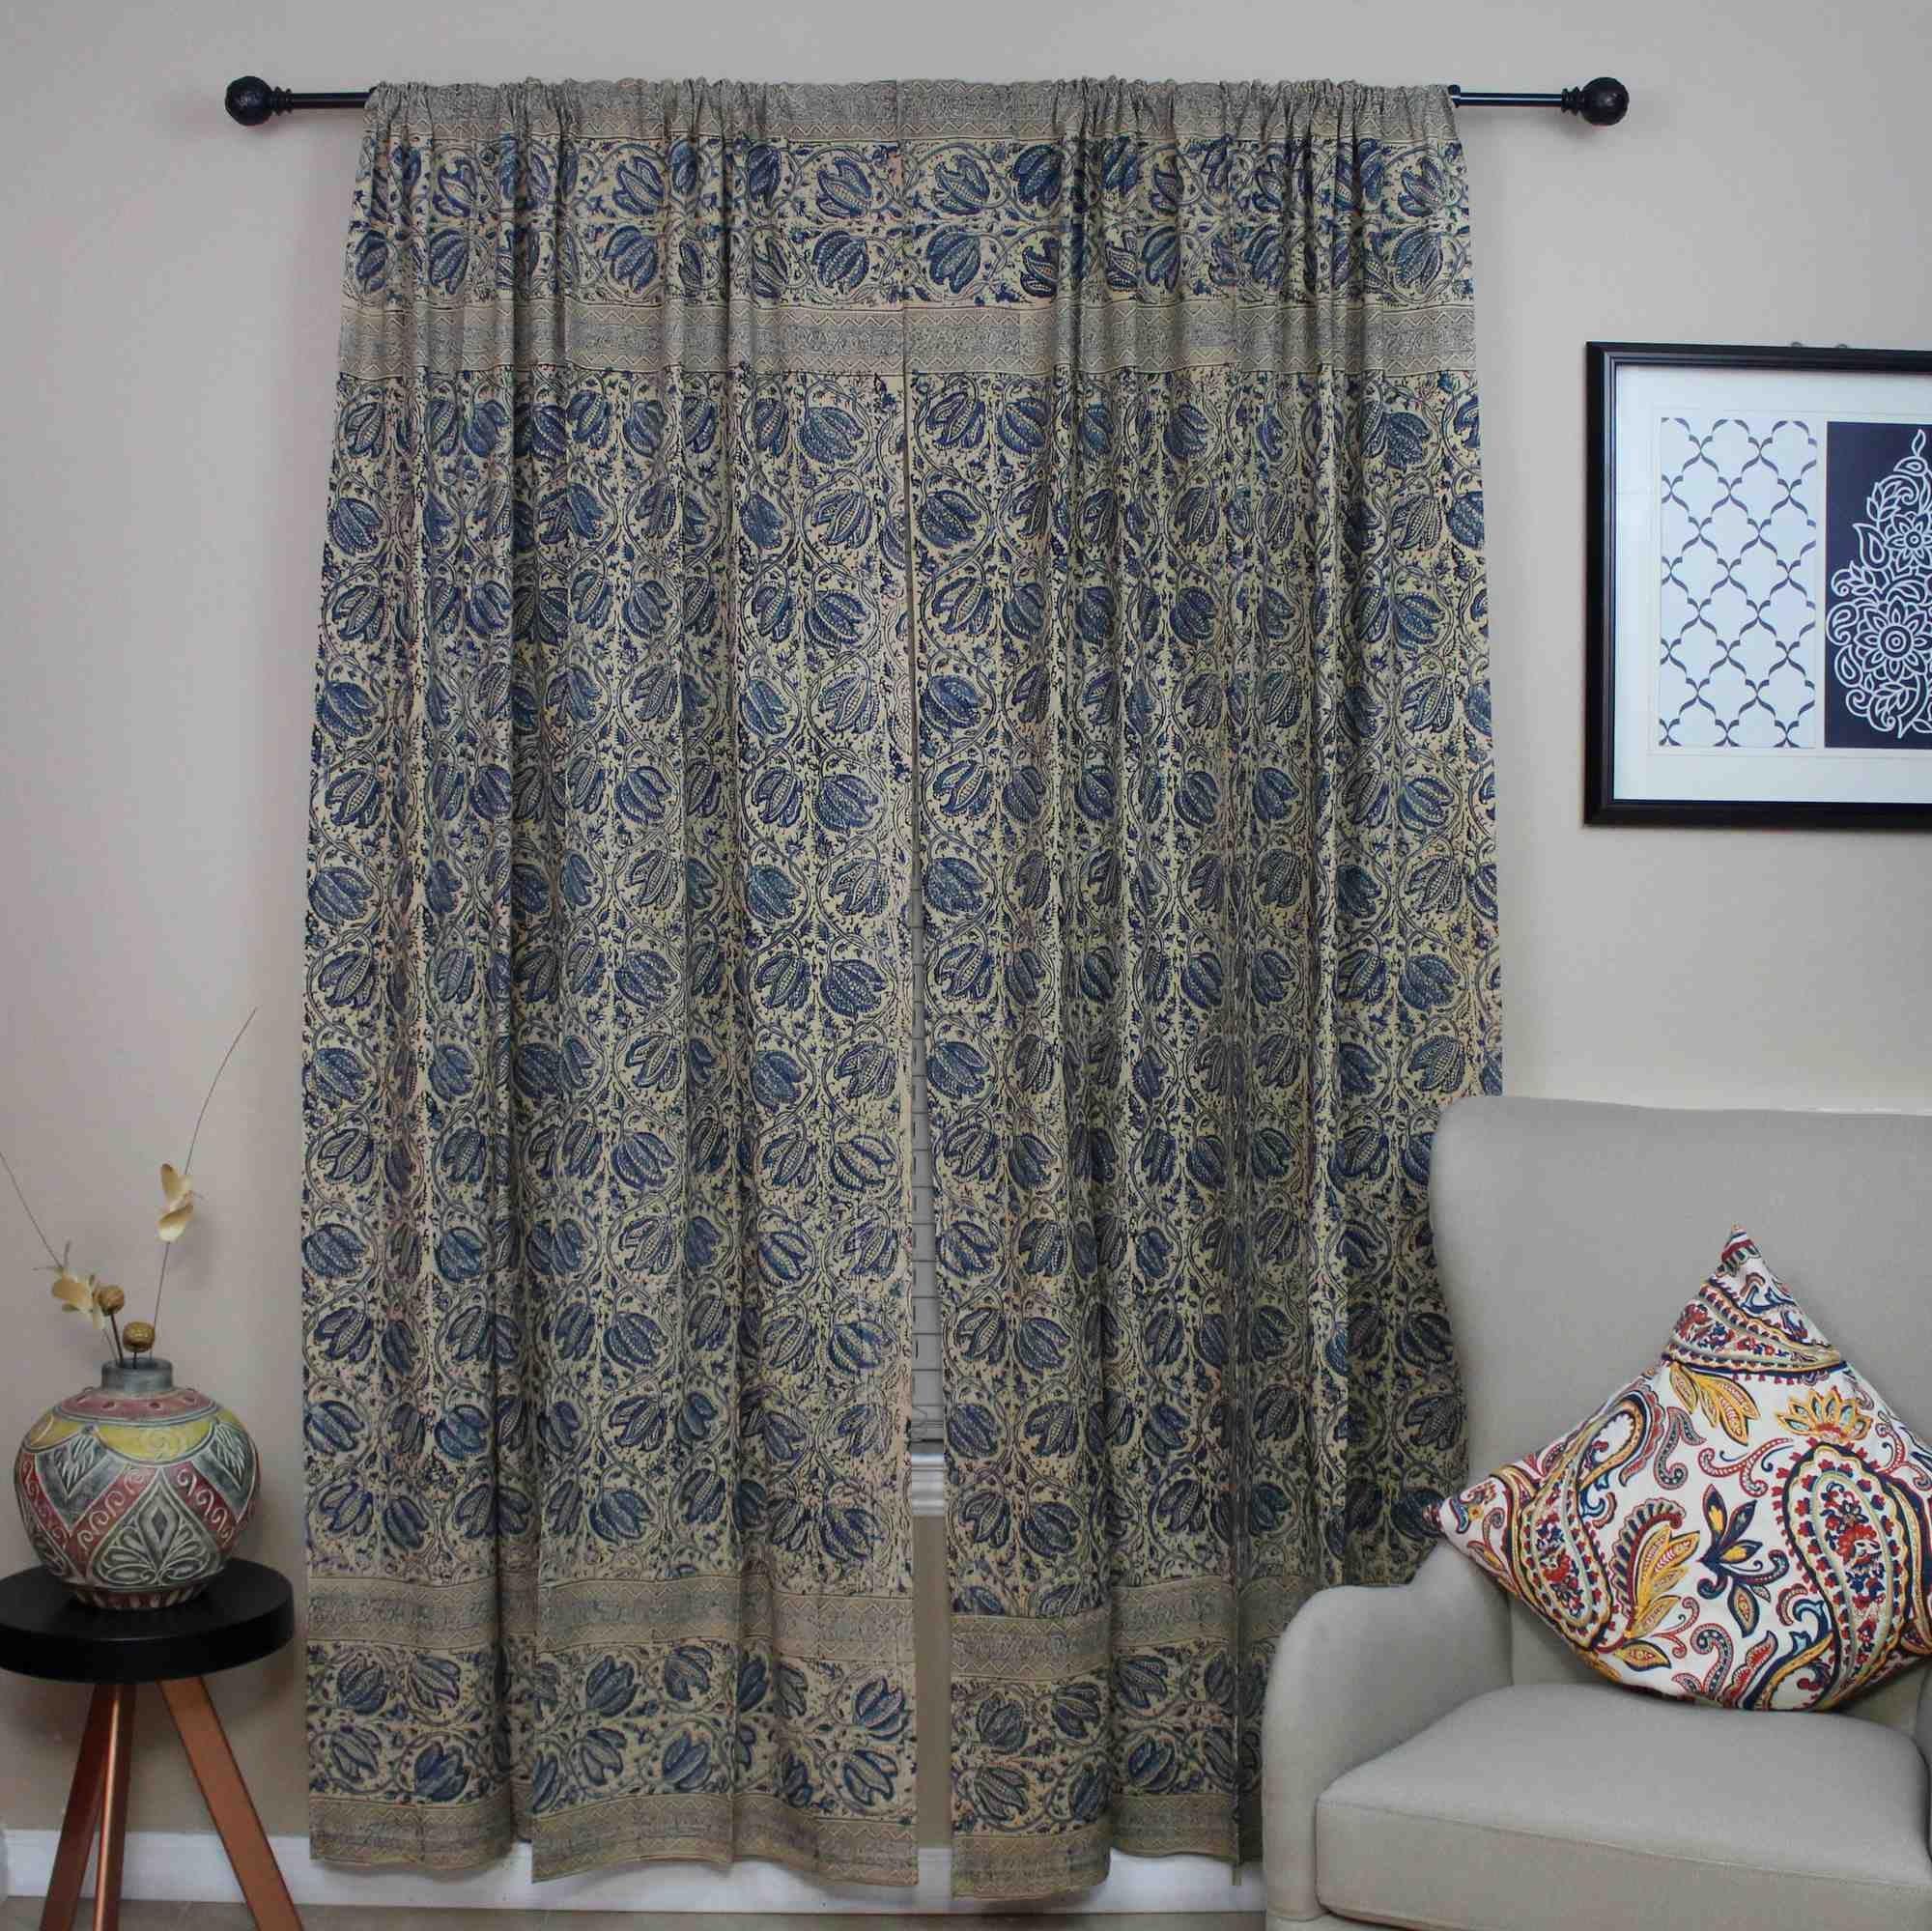 Handmade Cotton Block Print Veggie Dye Curtain Panel